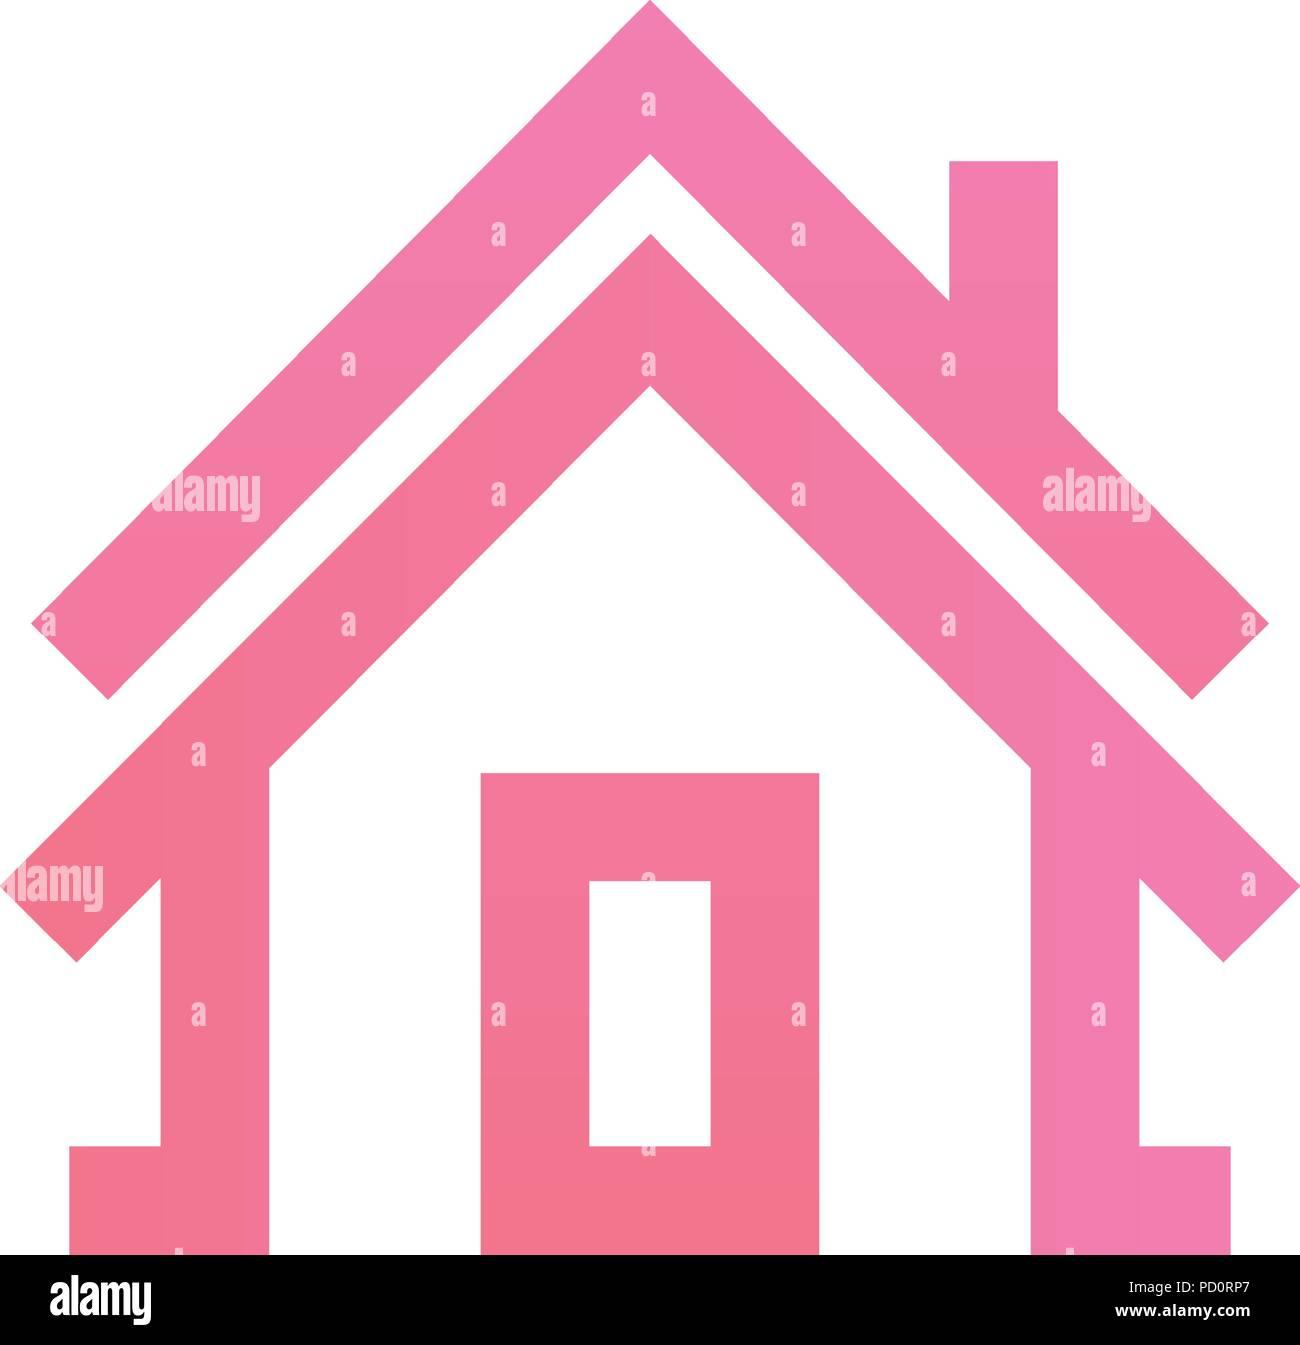 House Building Contour Outline Vector Stock Photos & House Building ...